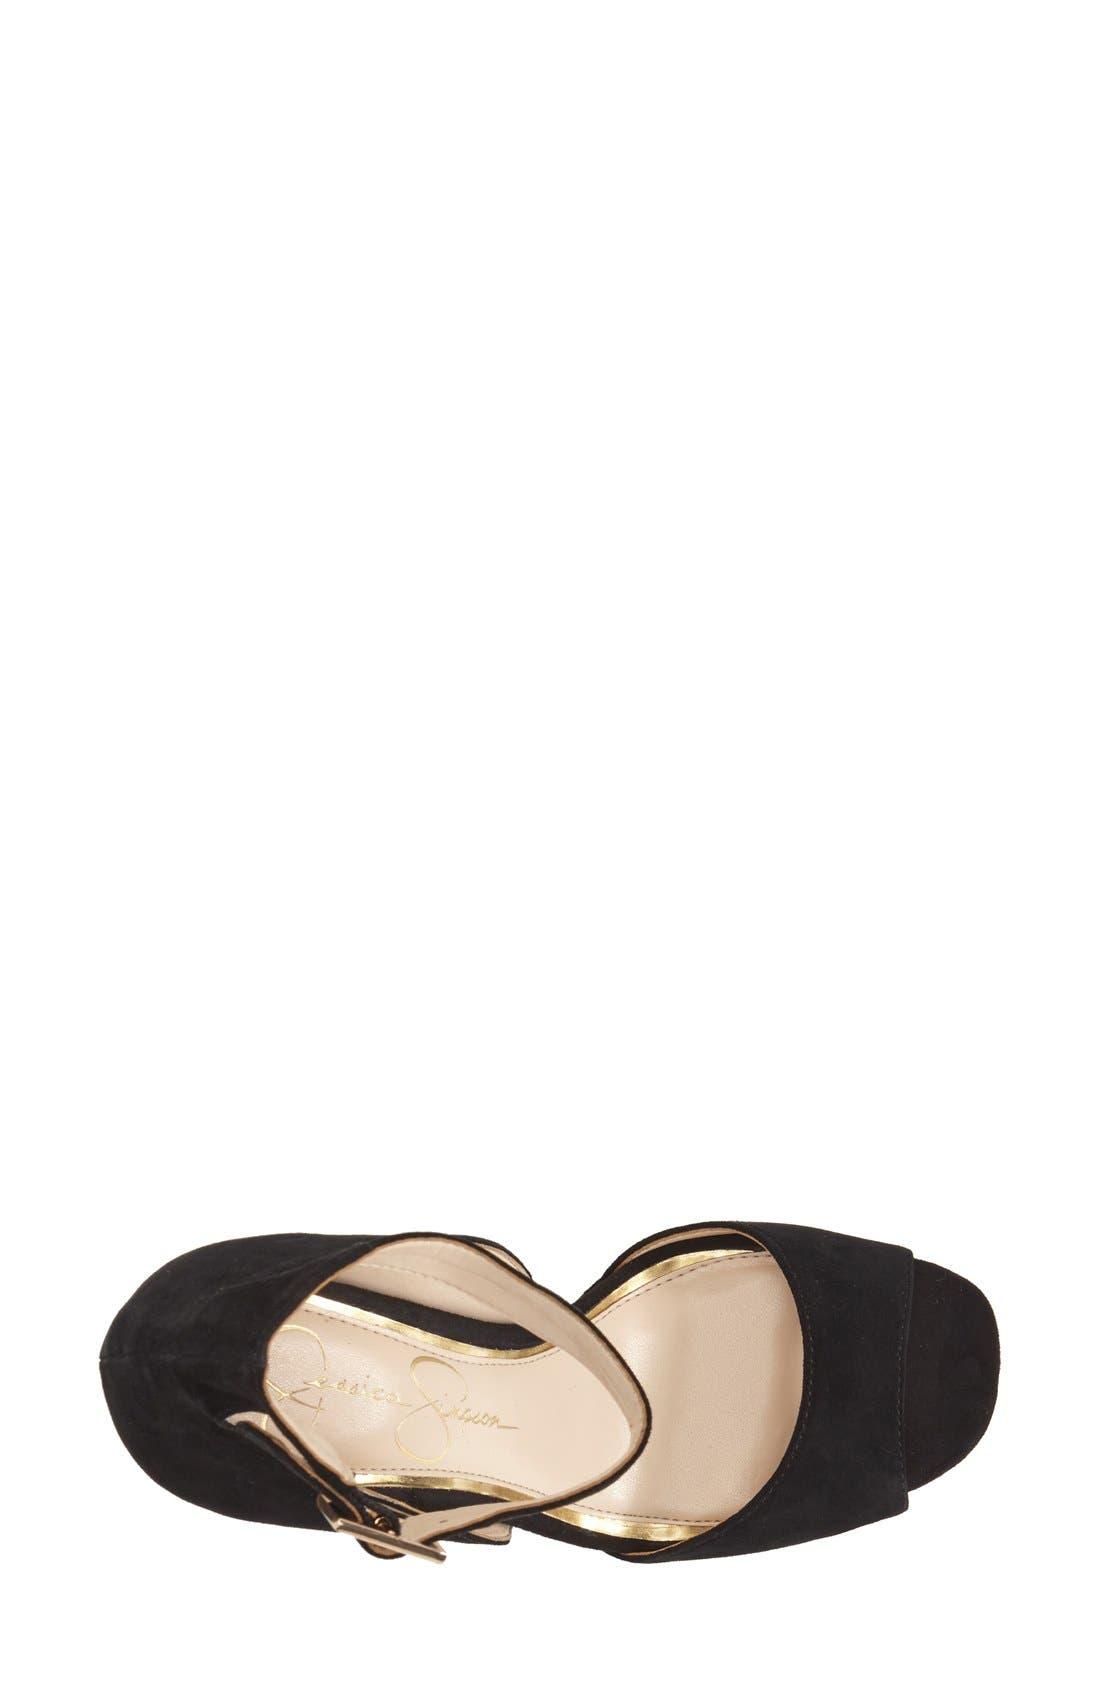 Alternate Image 3  - Jessica Simpson 'Athens' Ankle Strap Platform Sandal (Women)